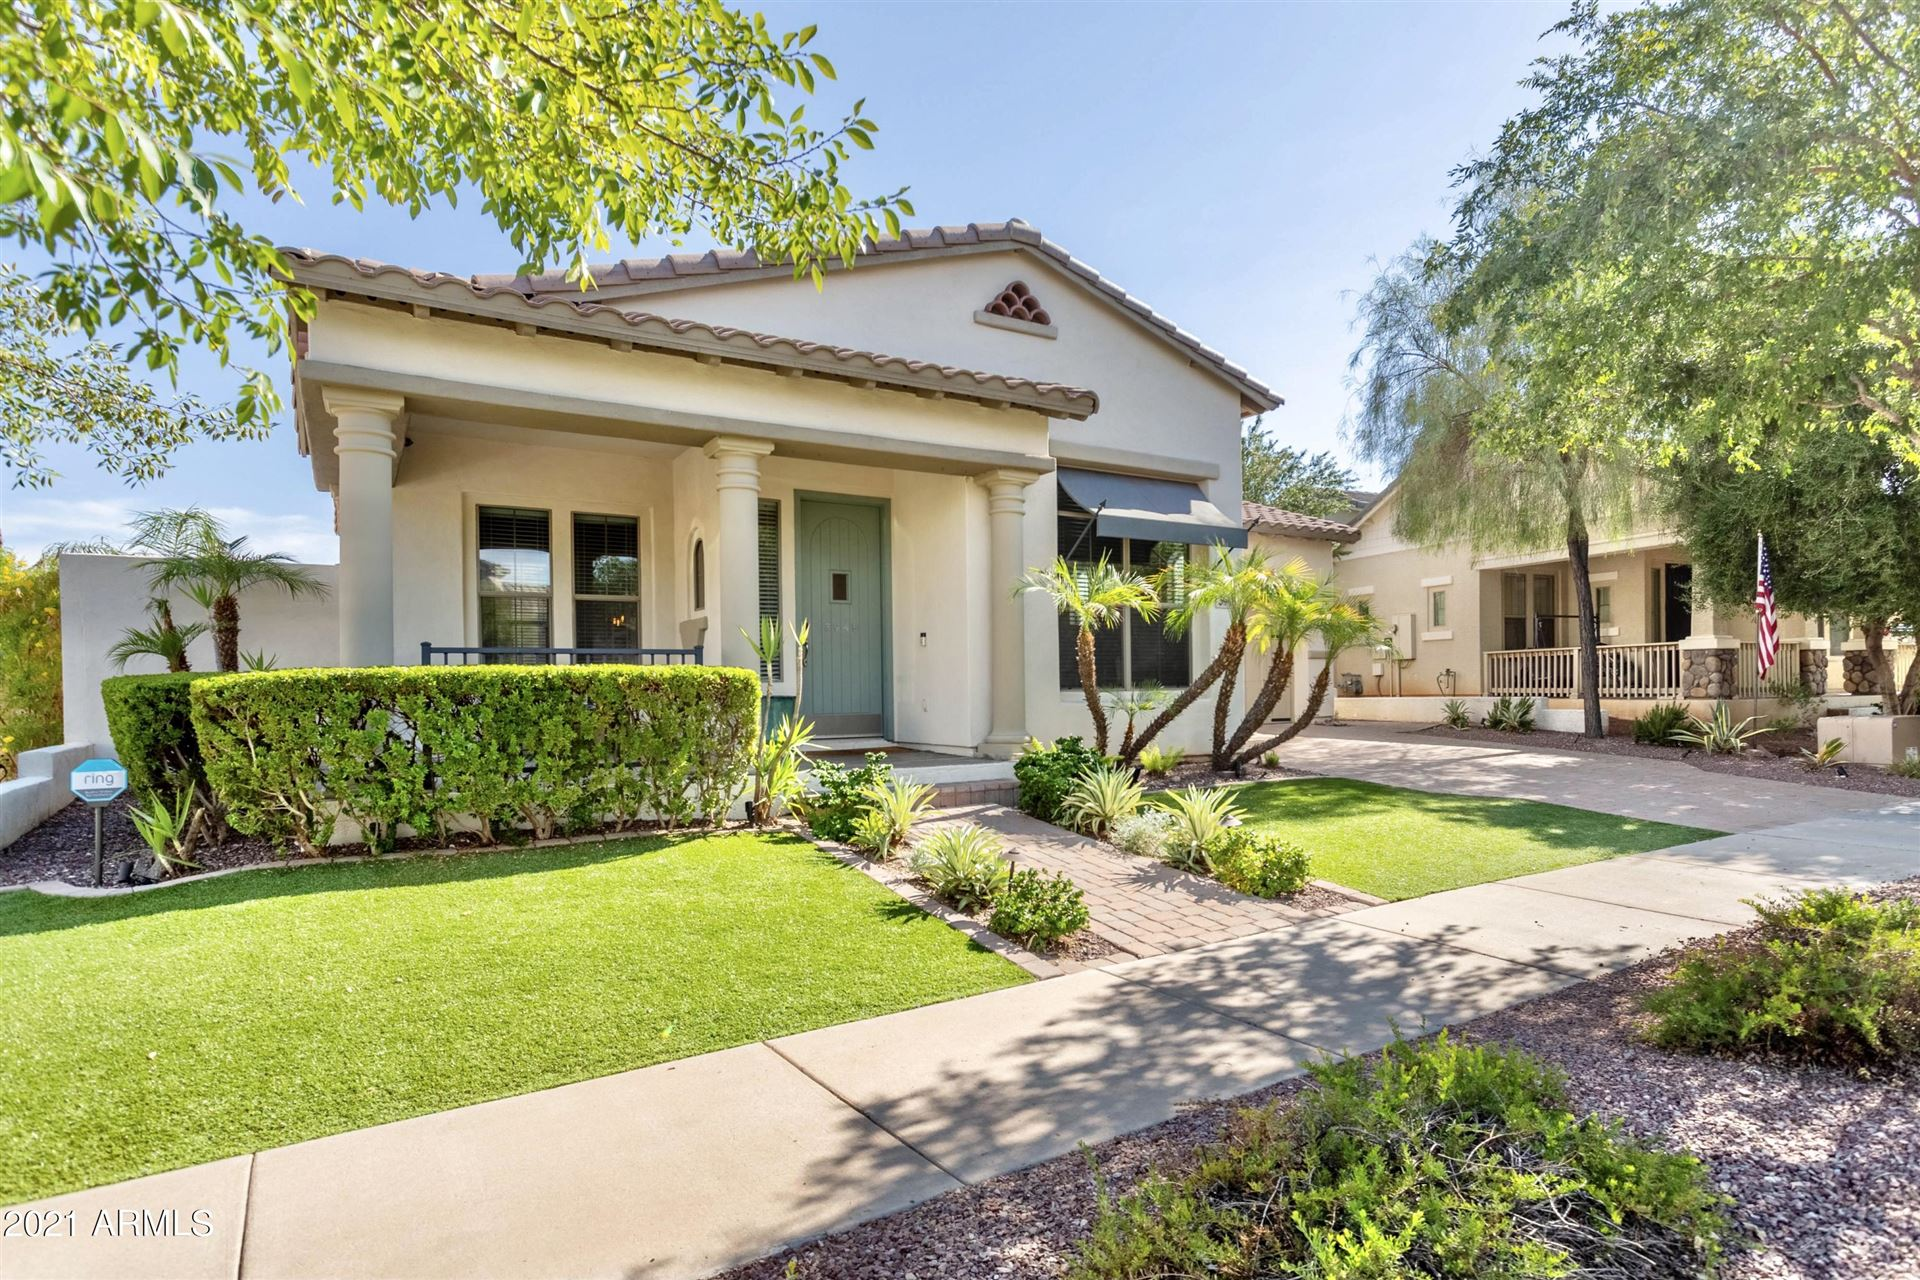 Photo of 3945 N FOUNDER Circle, Buckeye, AZ 85396 (MLS # 6257547)